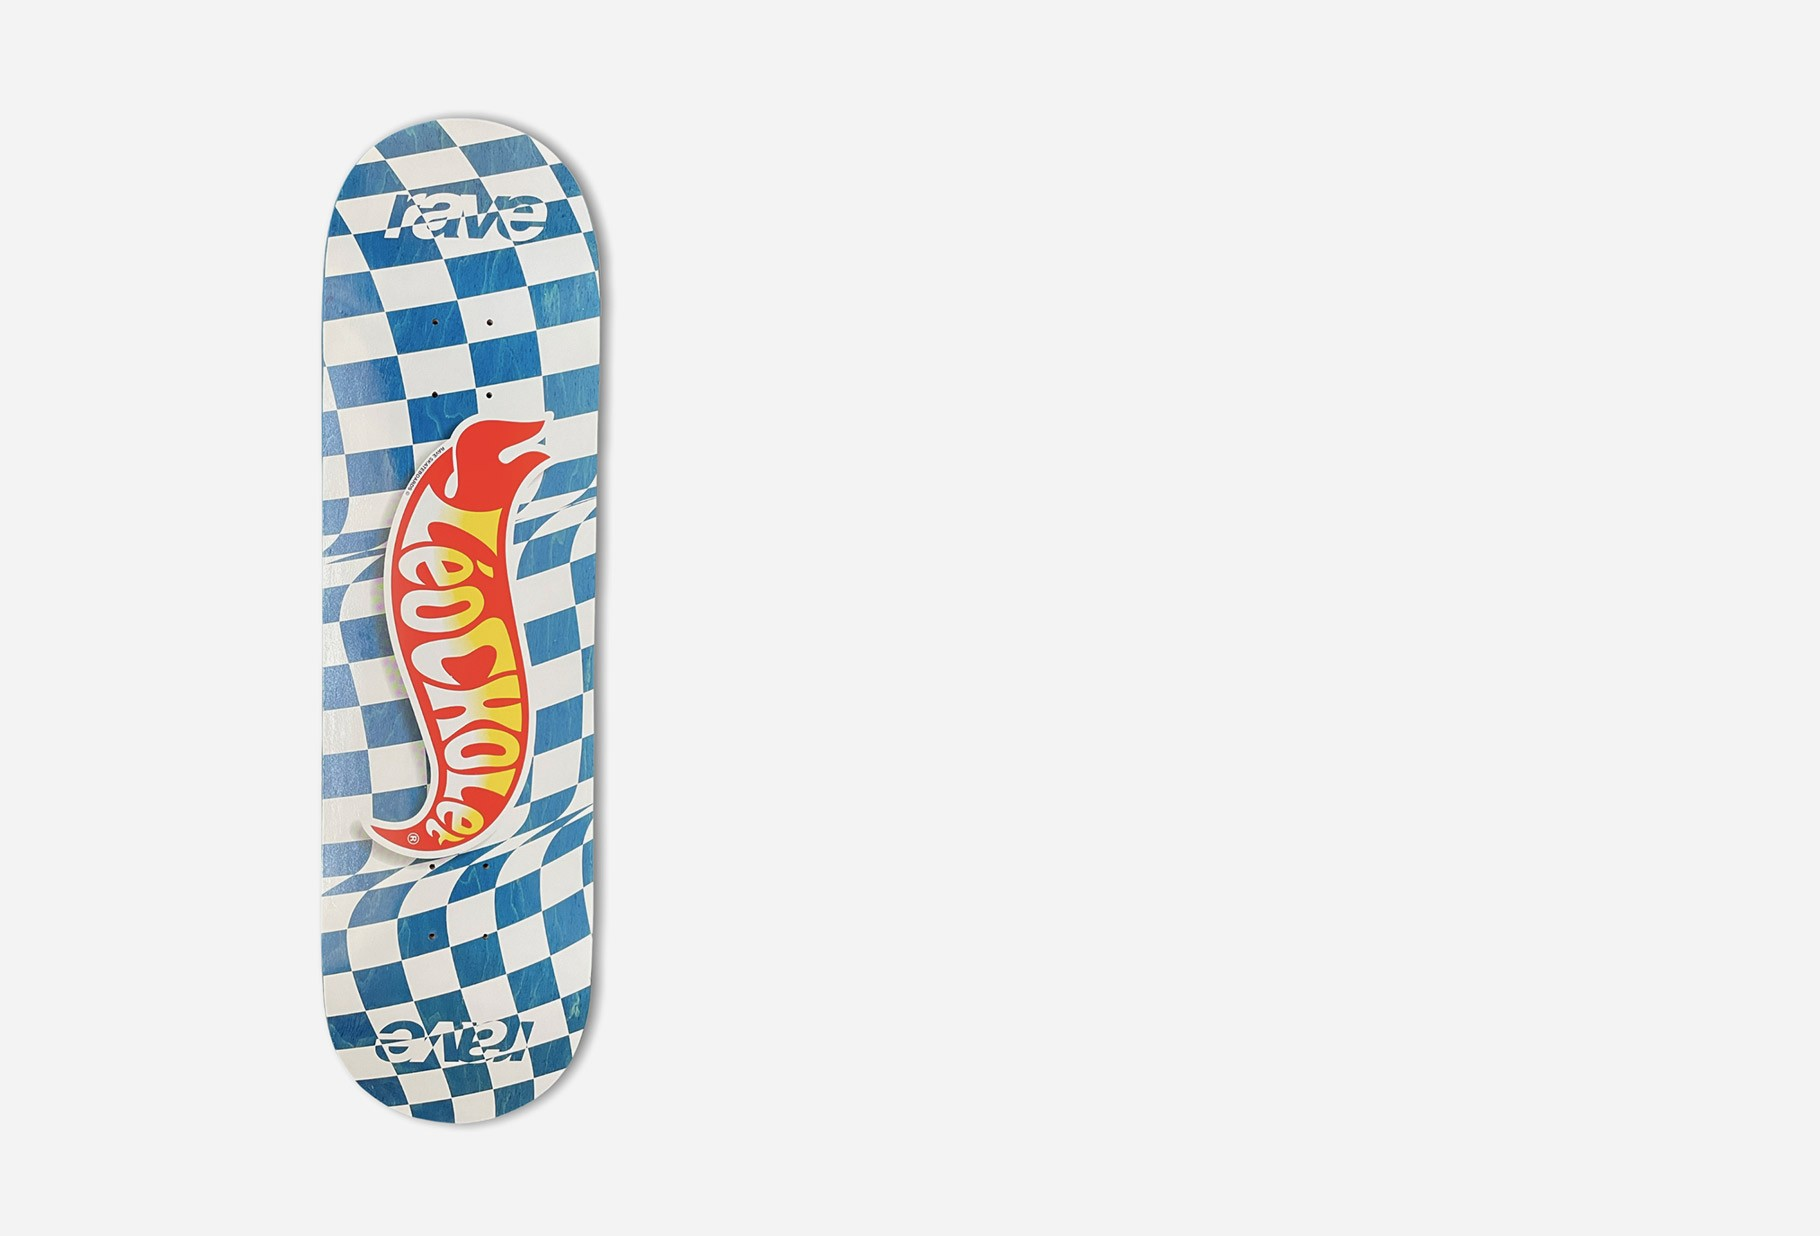 RAVE / Leo cholet pro board Blue